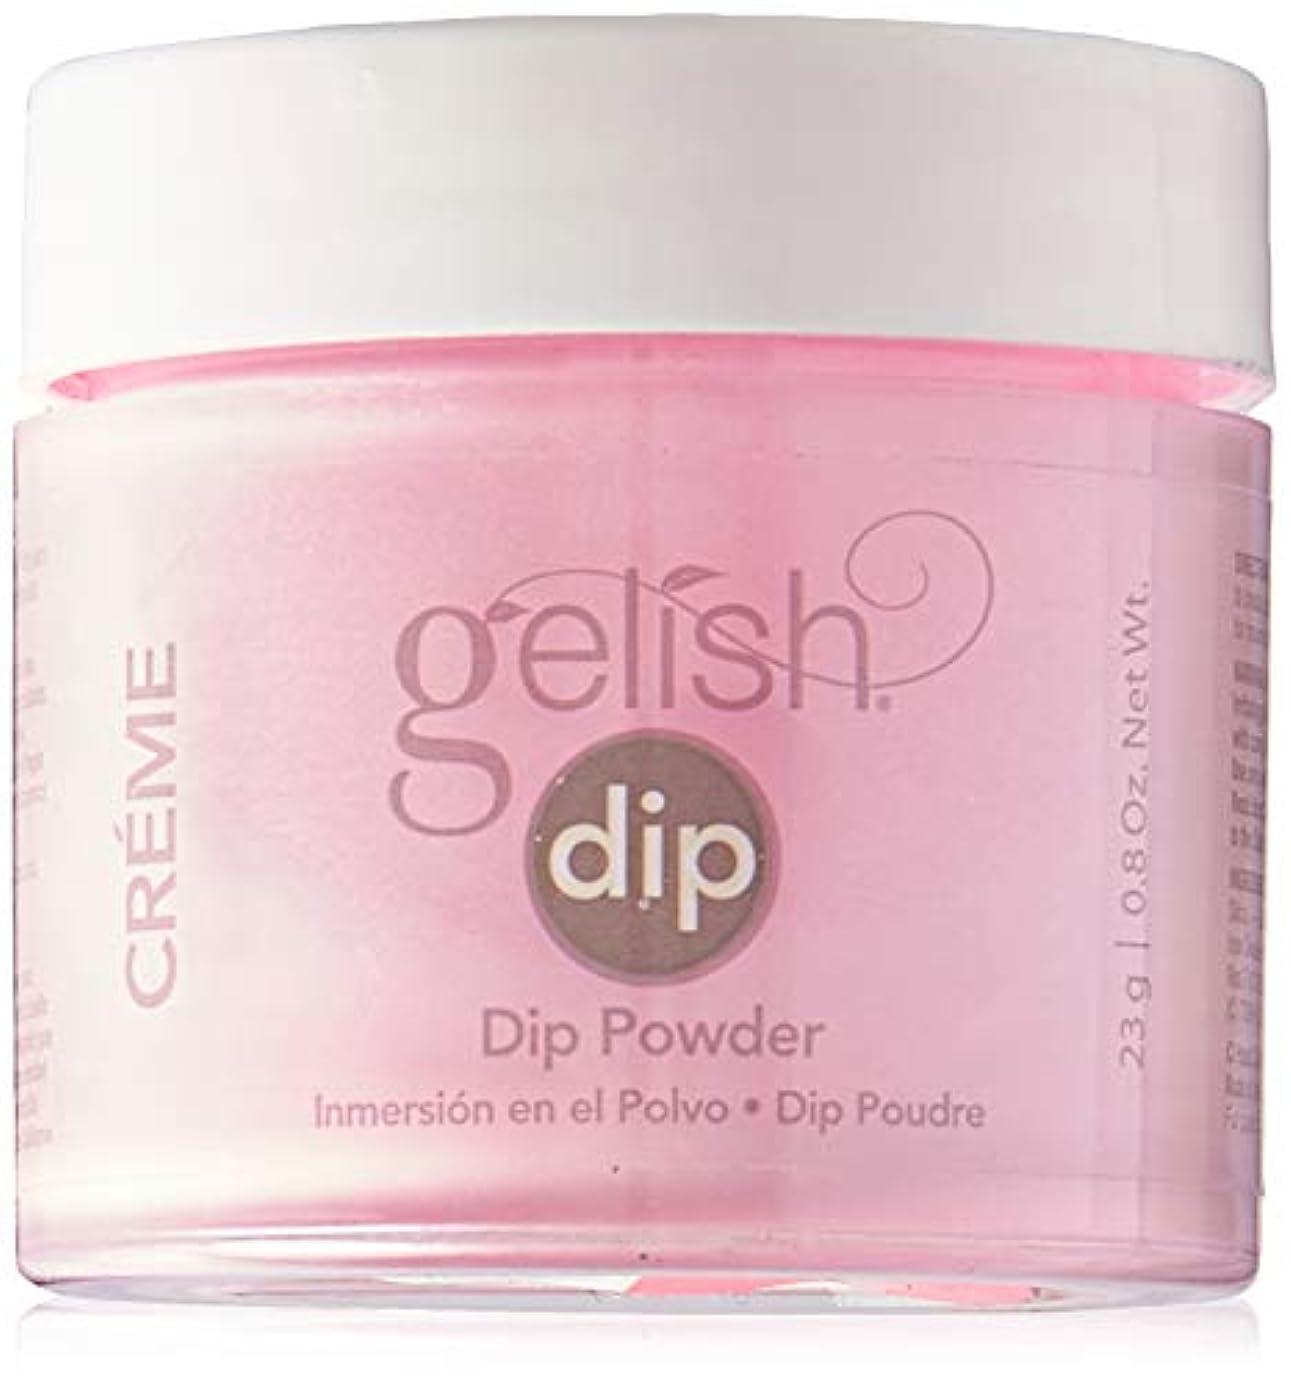 絶妙神話余韻Harmony Gelish - Acrylic Dip Powder - Look At You, Pink-achu! - 23g / 0.8oz